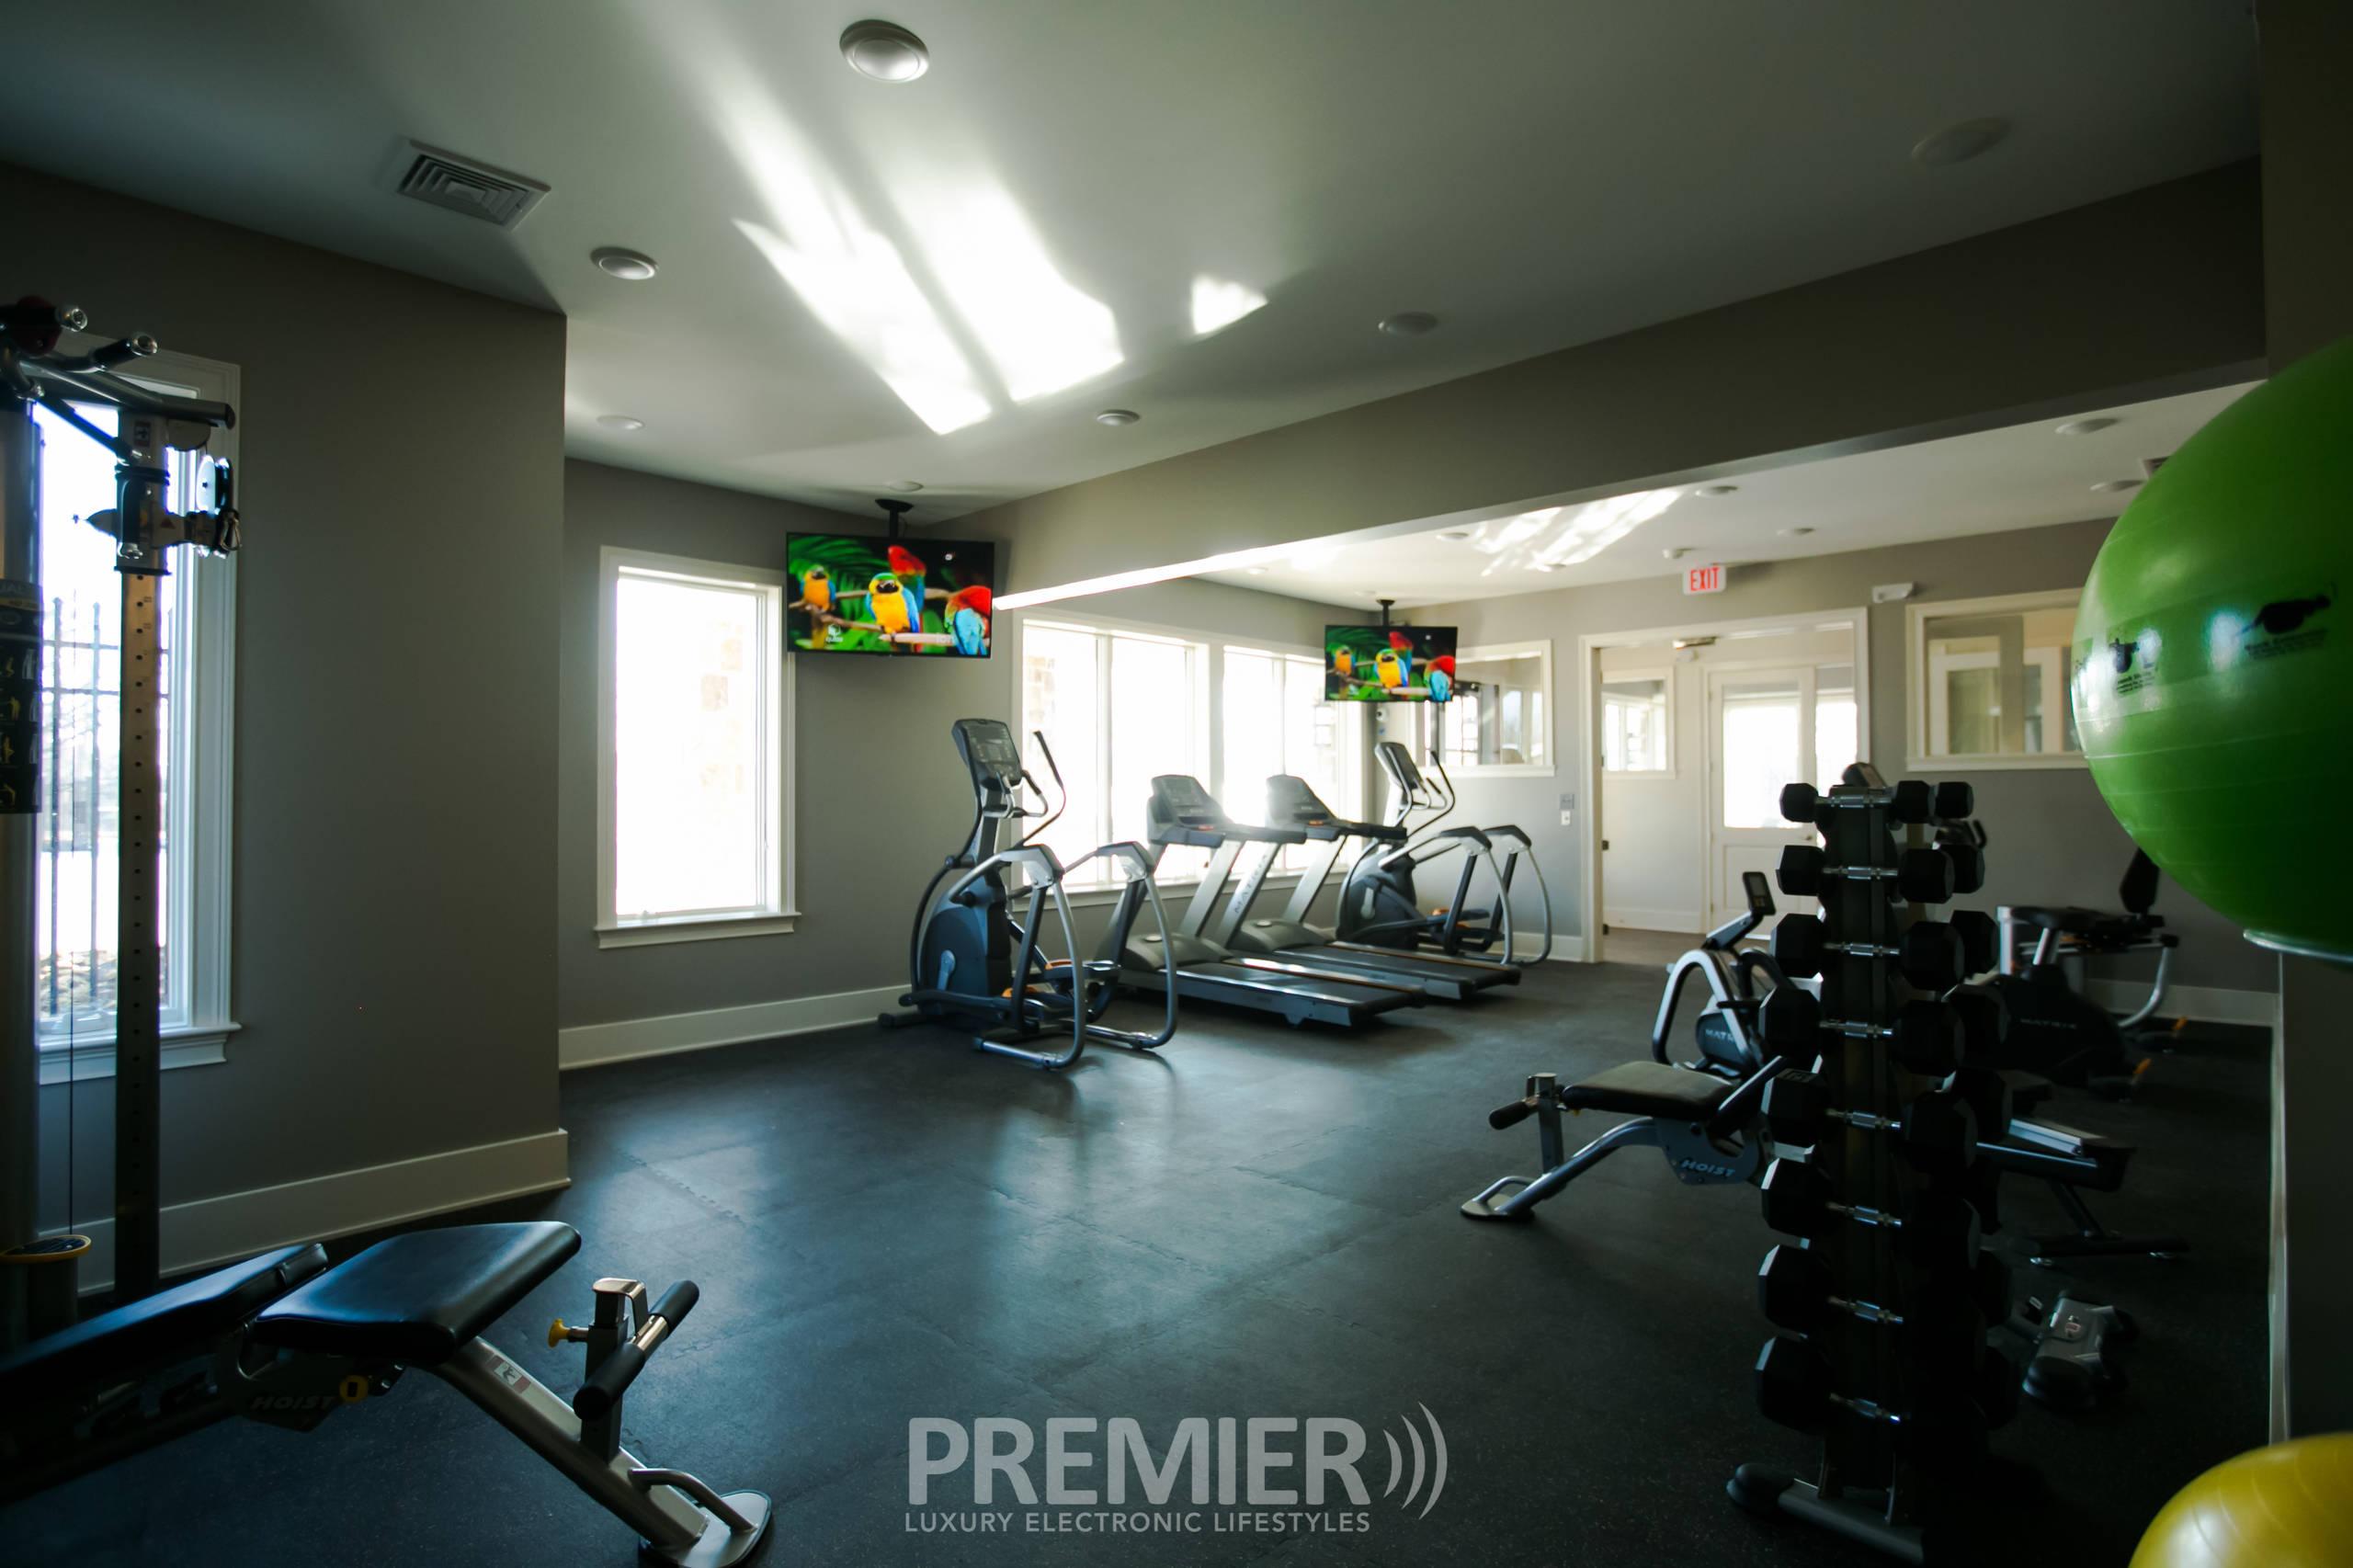 Residential Amenity Center